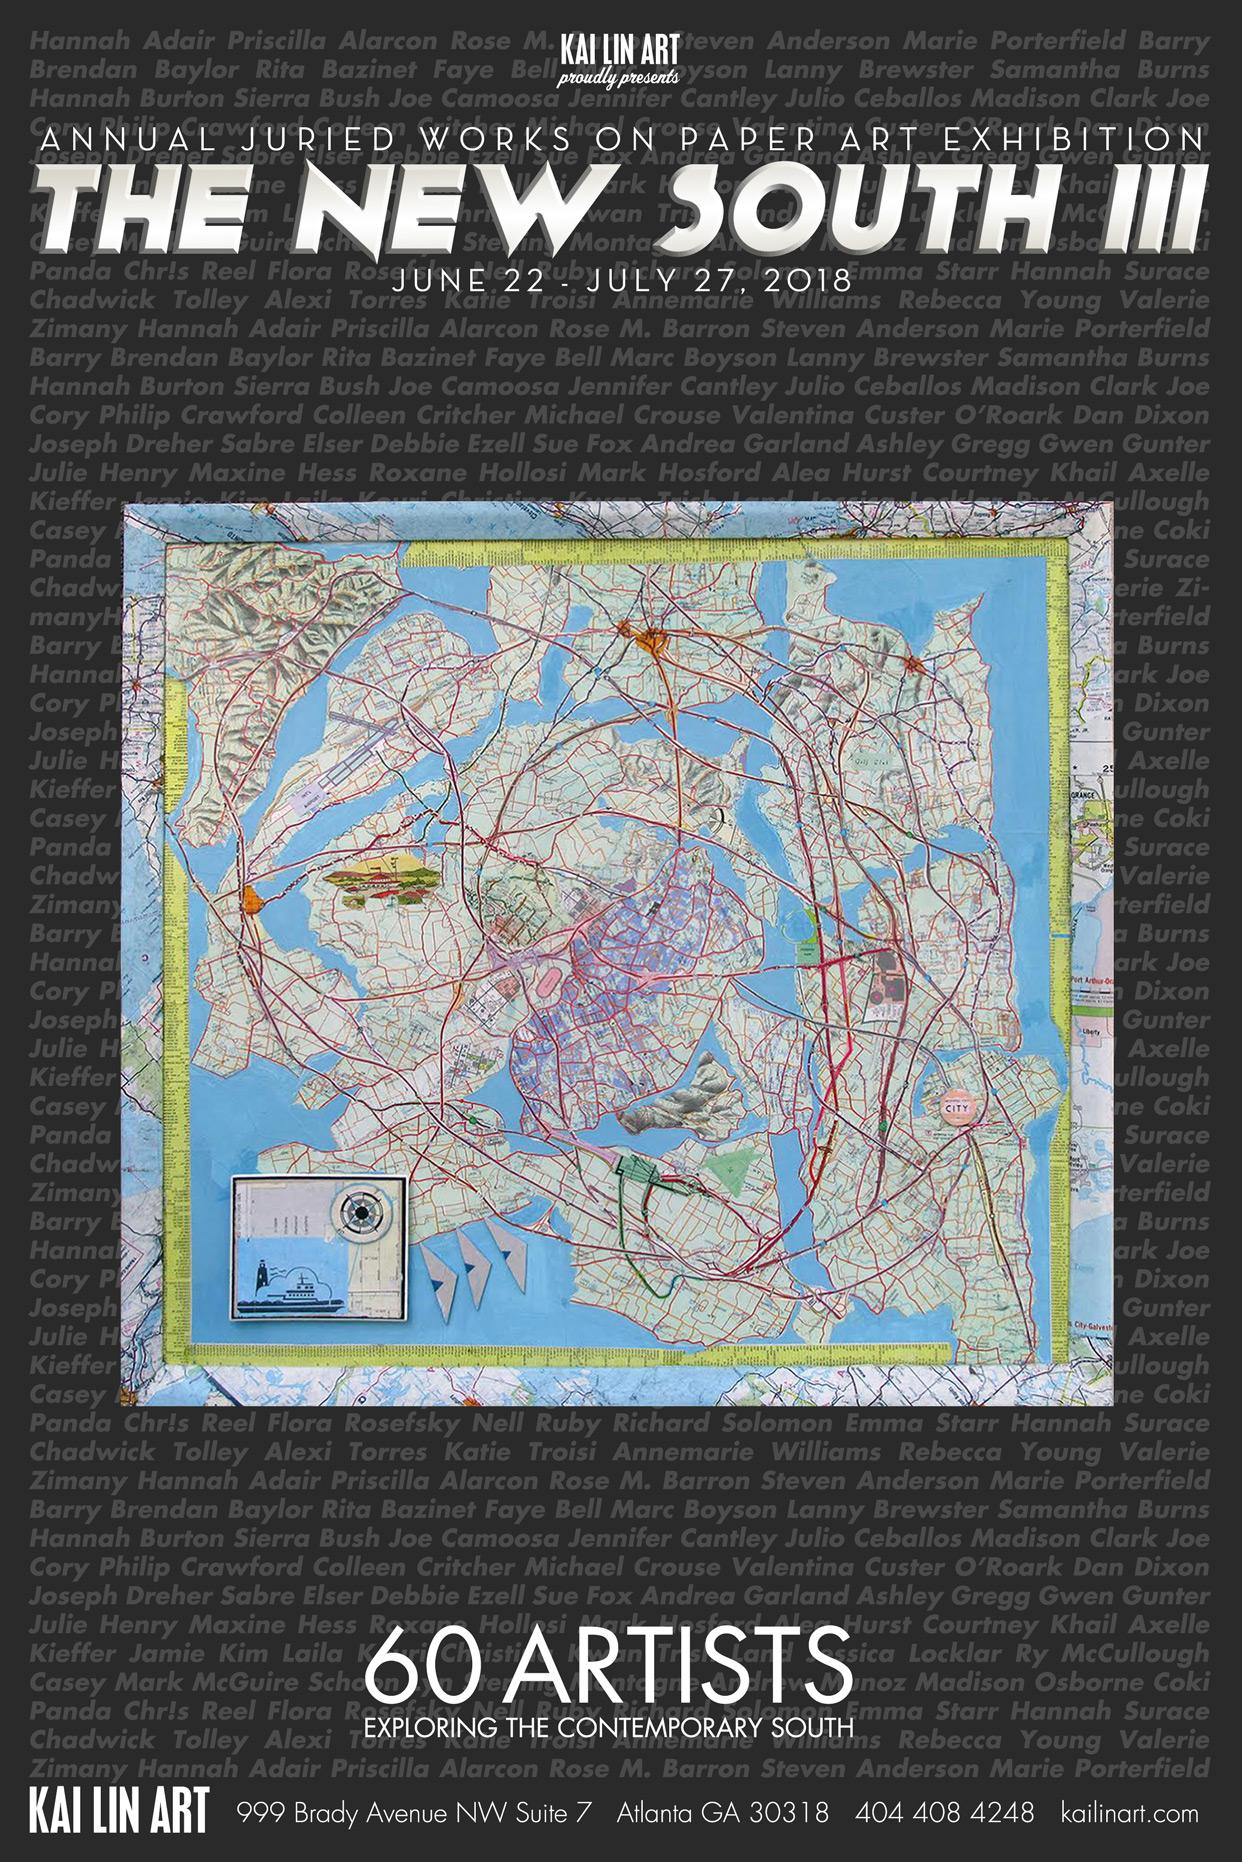 Brewster_Lanny_A-Leisurely-Trip-Around-the-City_Paper_Wood_Glue_19x20.jpg